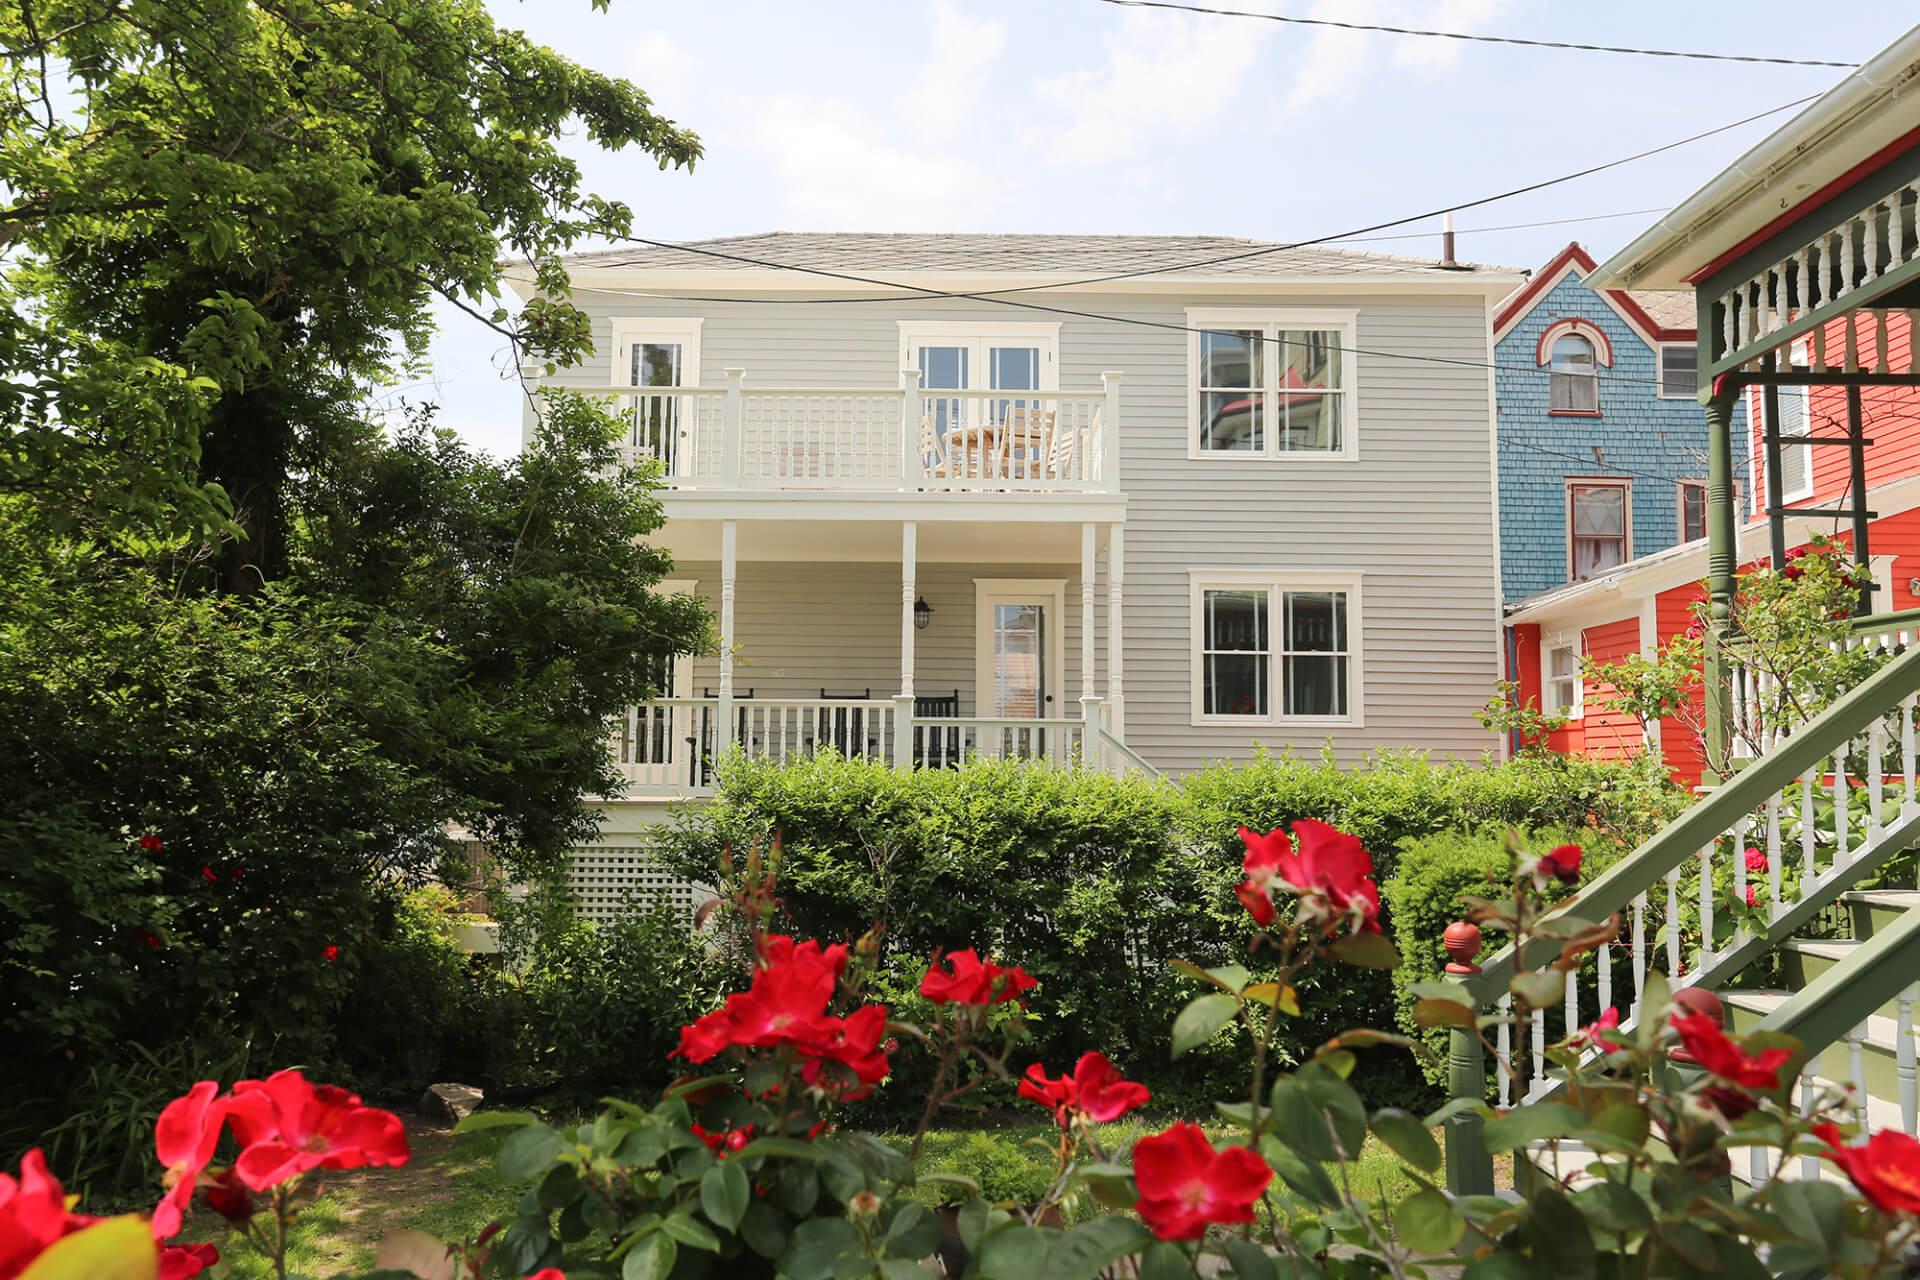 Cape May Cottage Rental Nj Romantic Getaway Cape Resorts